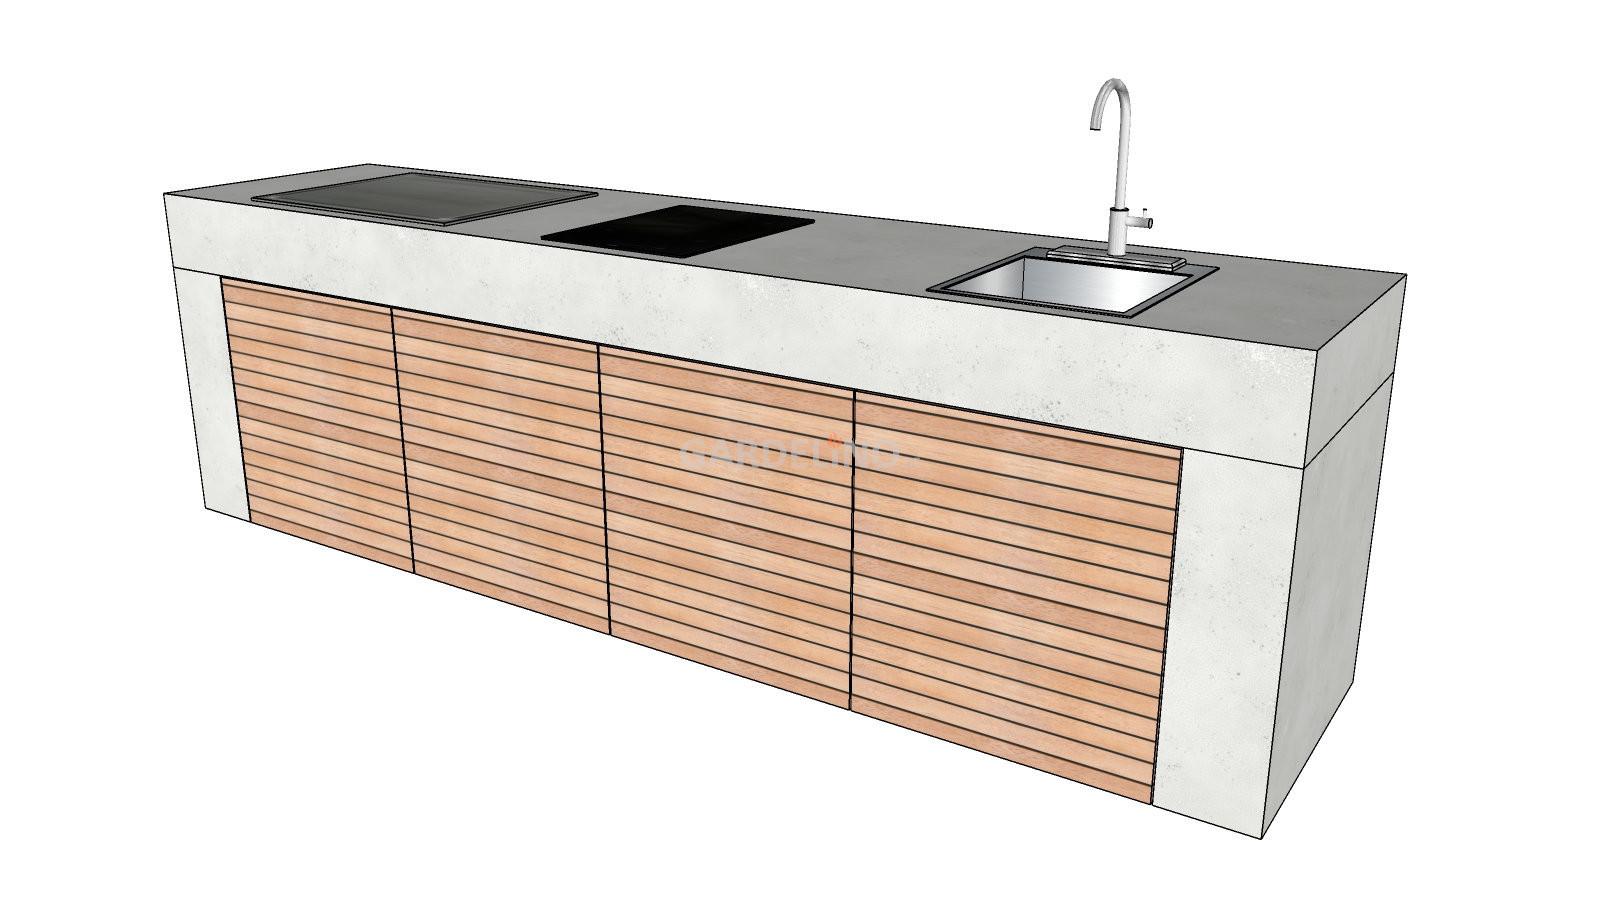 Outdoor Küche Ohne Grill : Outdoor küche ohne grill outdoor küche für den außenbereich in